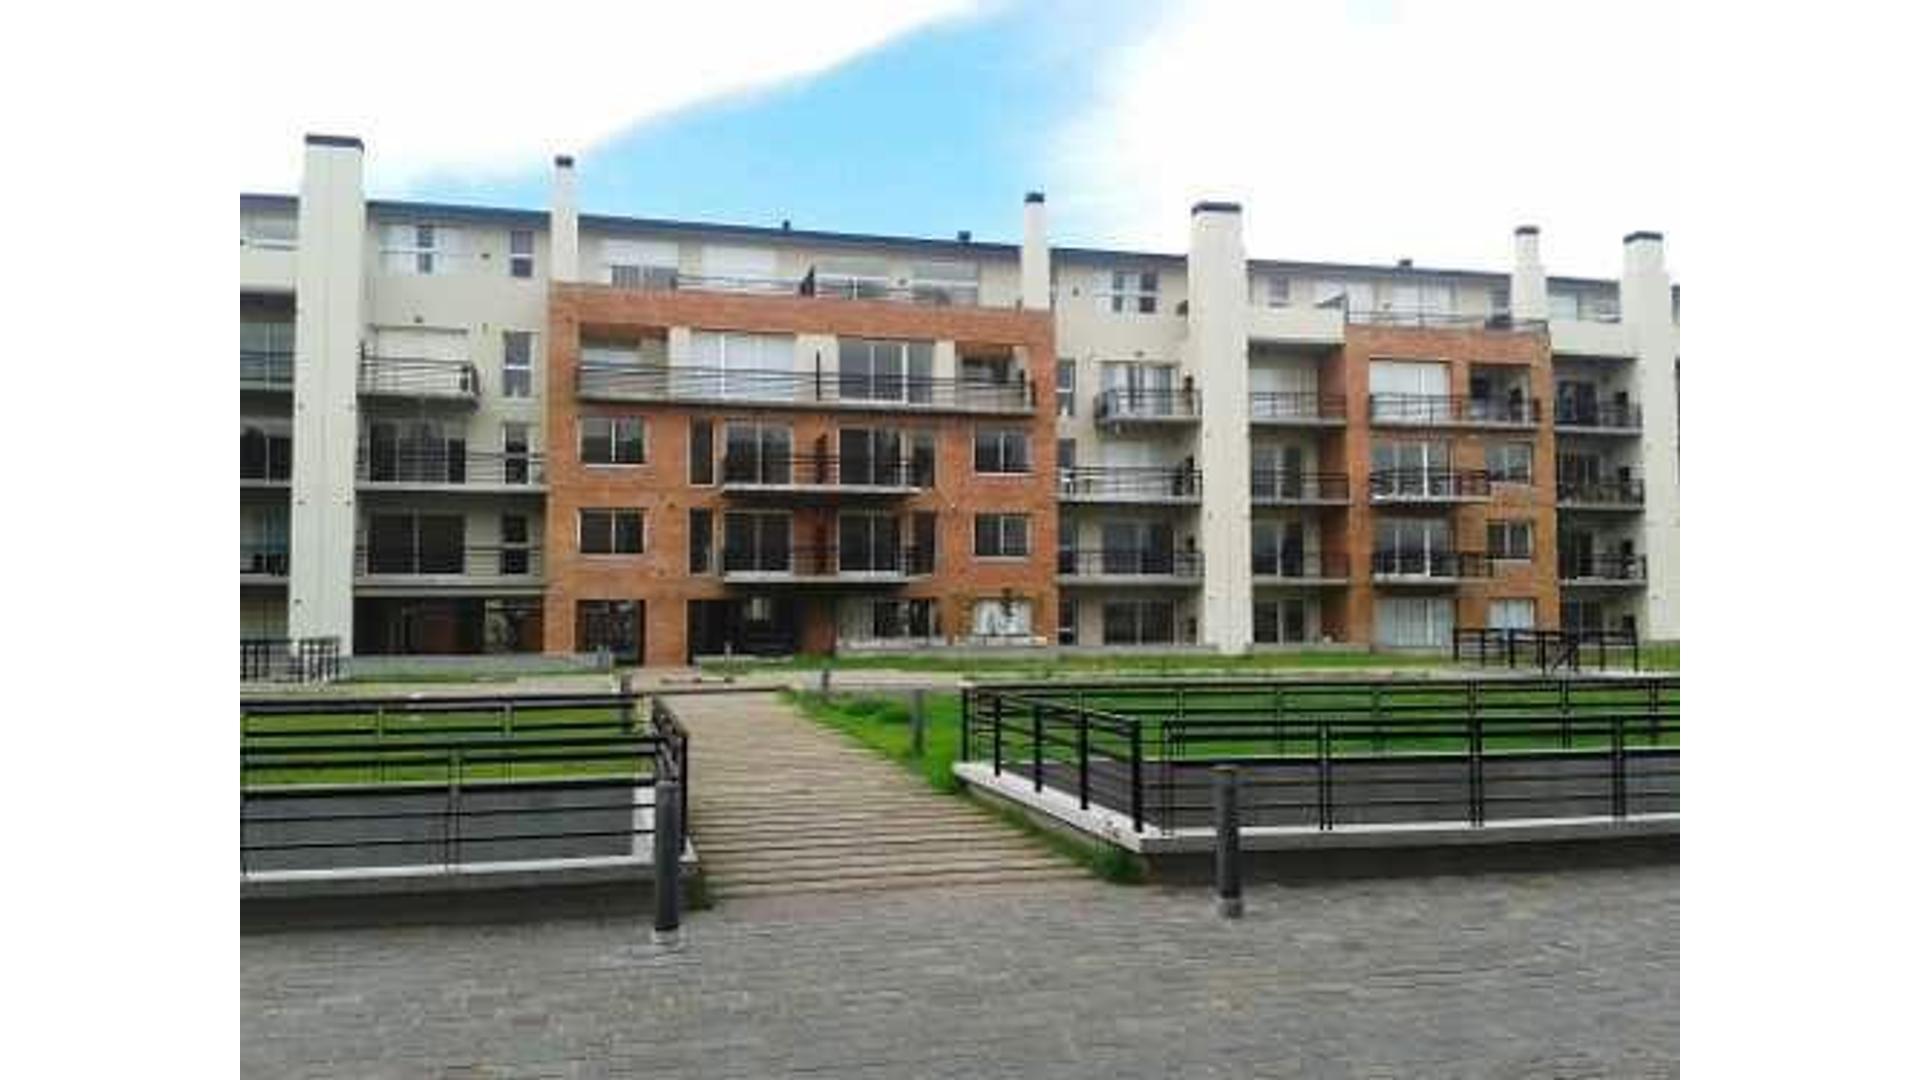 Riobamba 400 Beccar Plaza 2. Departamento 5 amb con terraza, 2 cocheras y baulera